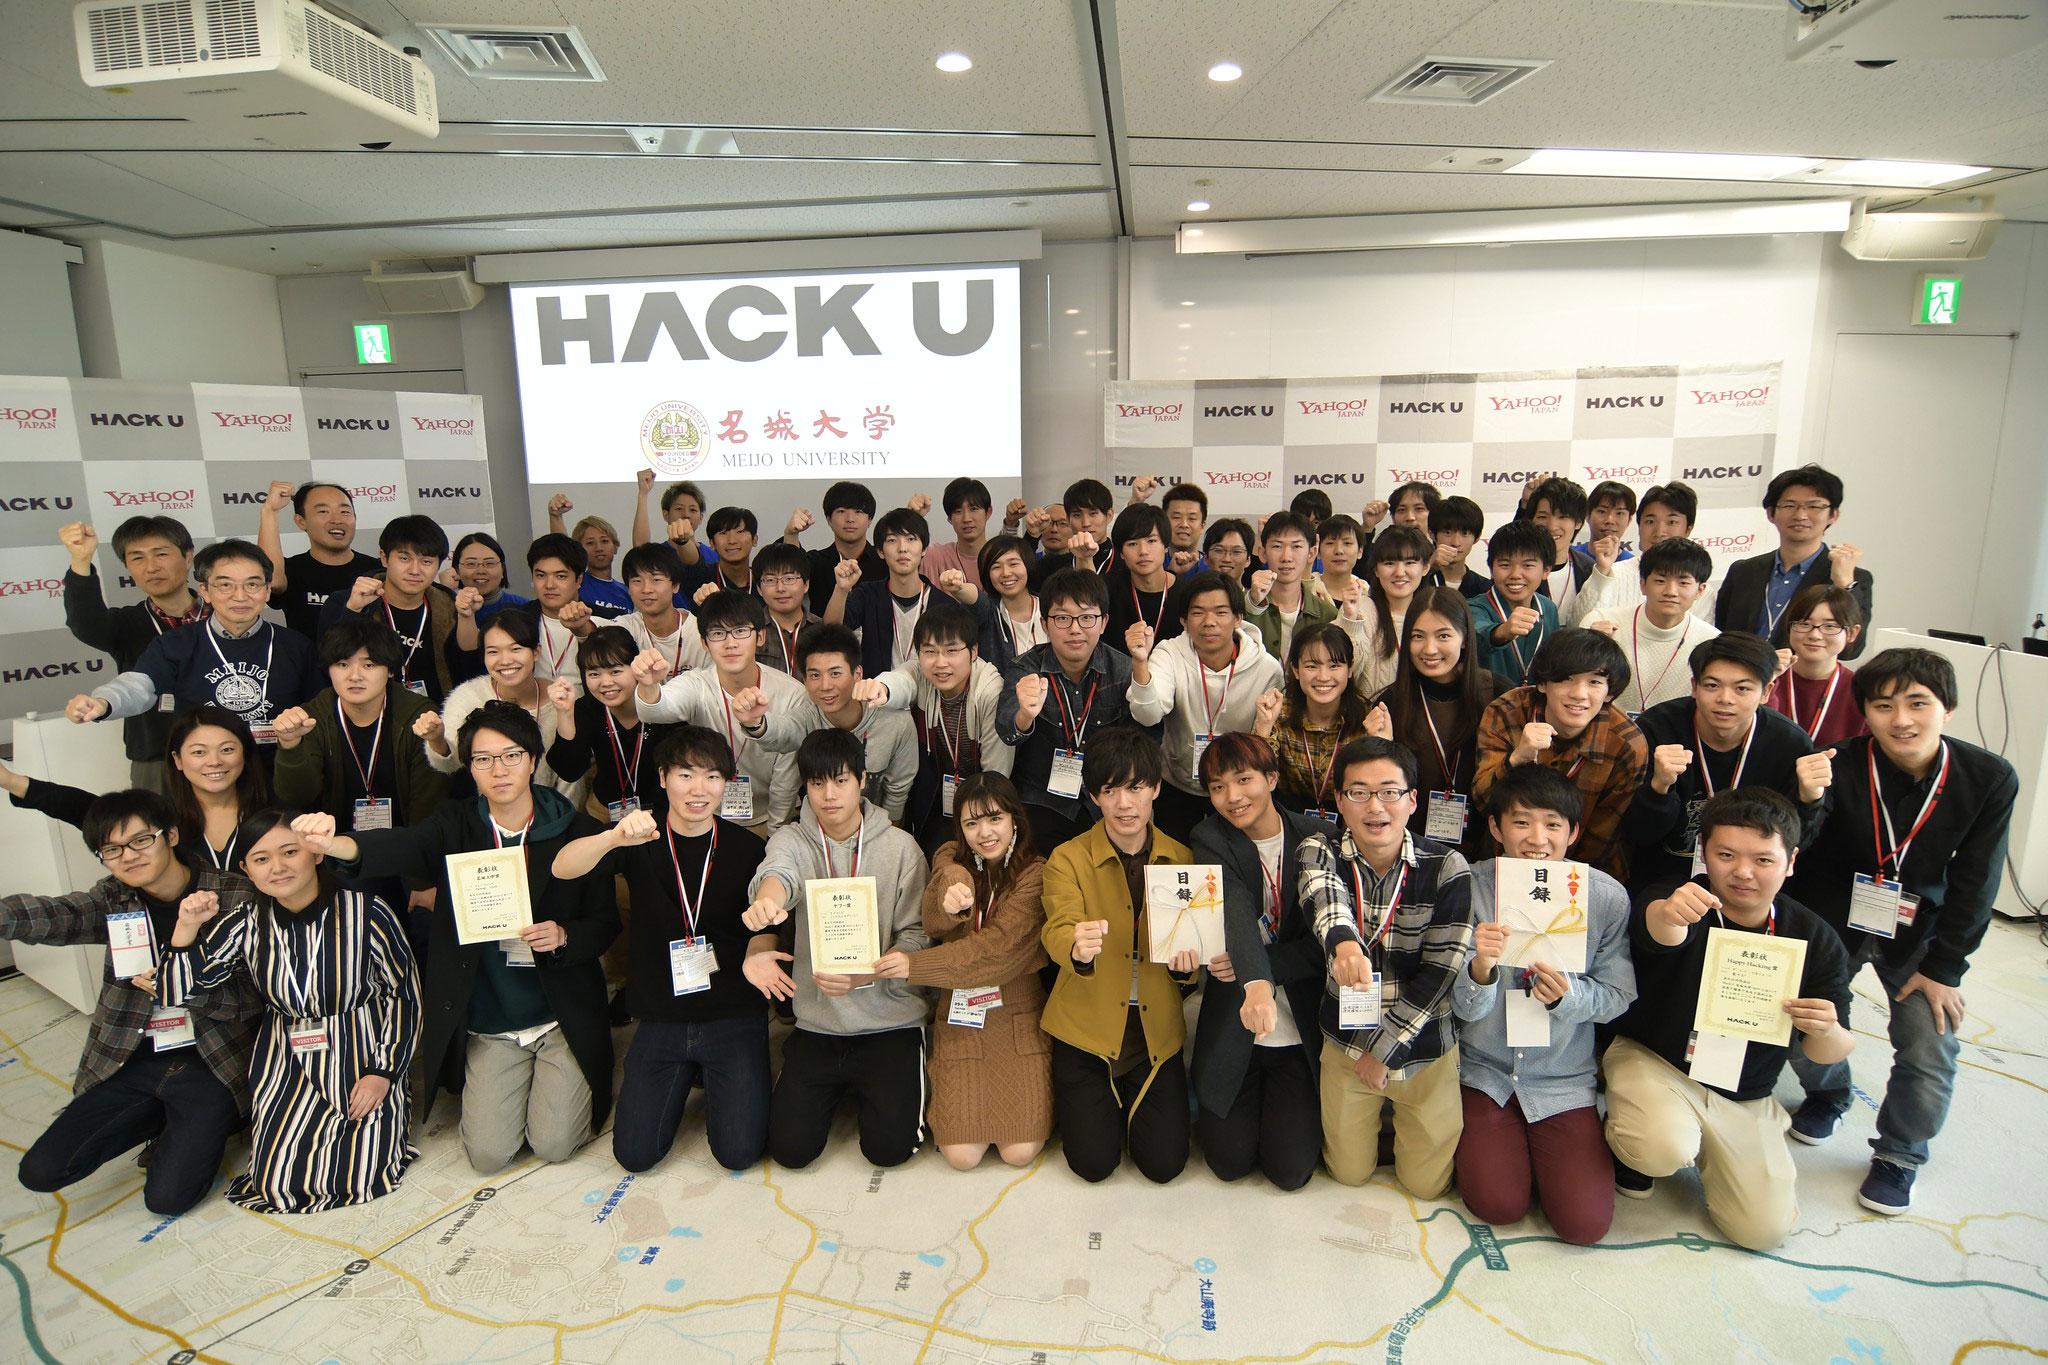 Hack U 名城大学 2019のキービジュアル画像